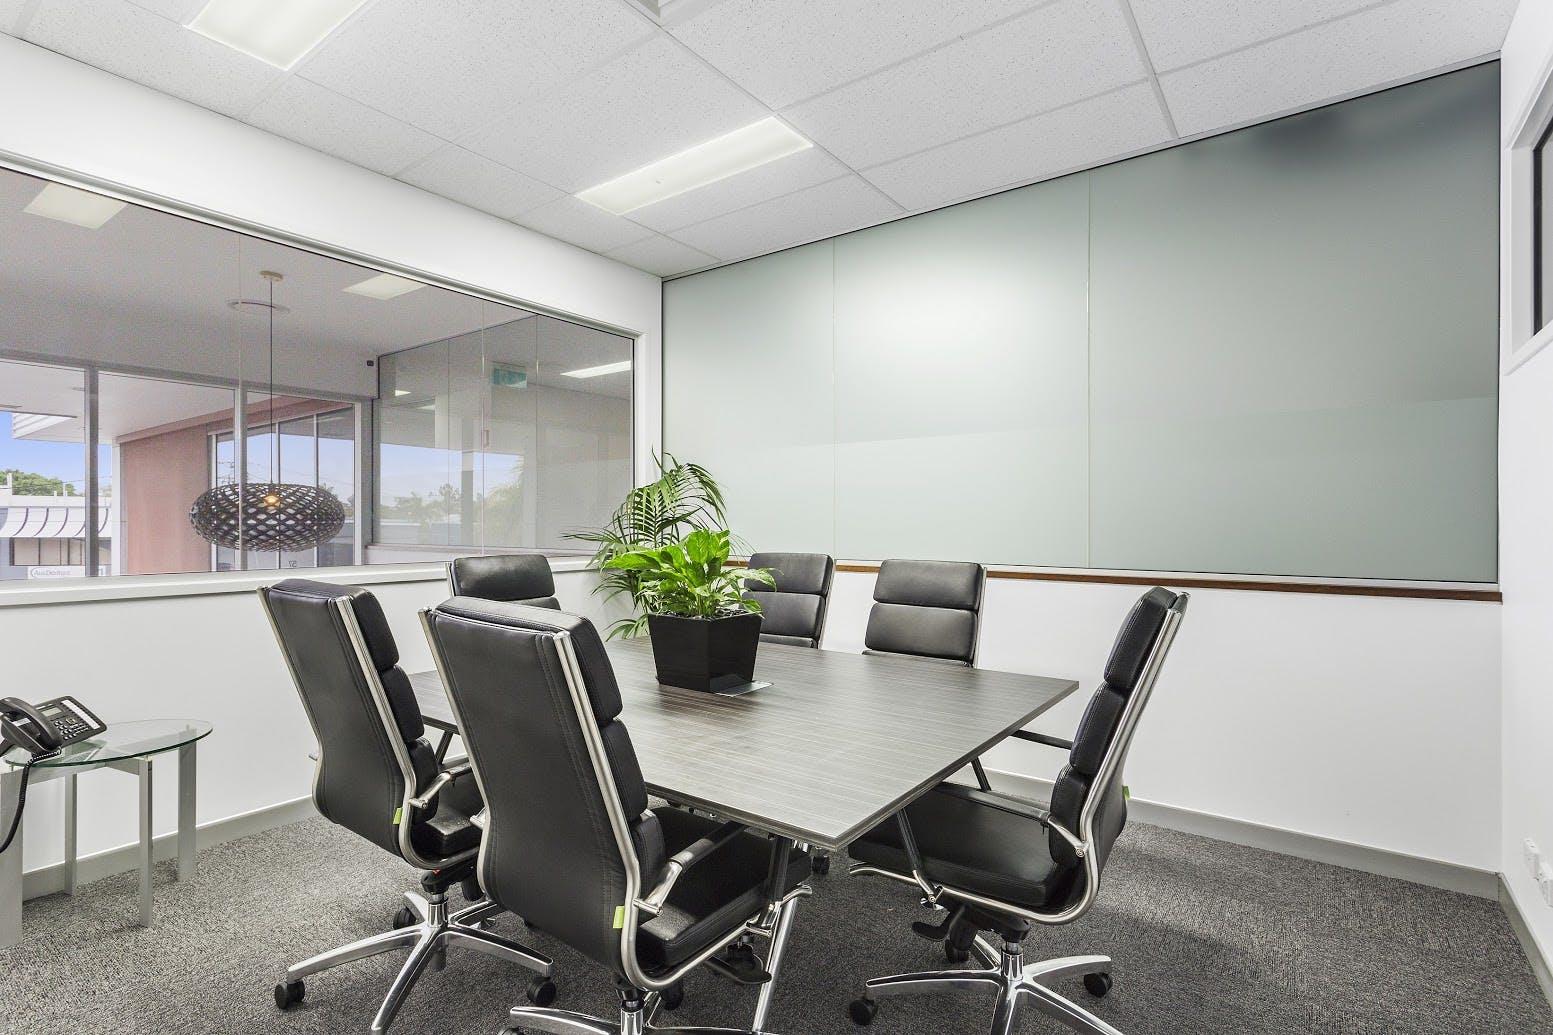 Laidlaw Boardroom for 8 people, meeting room at Studio42, image 1